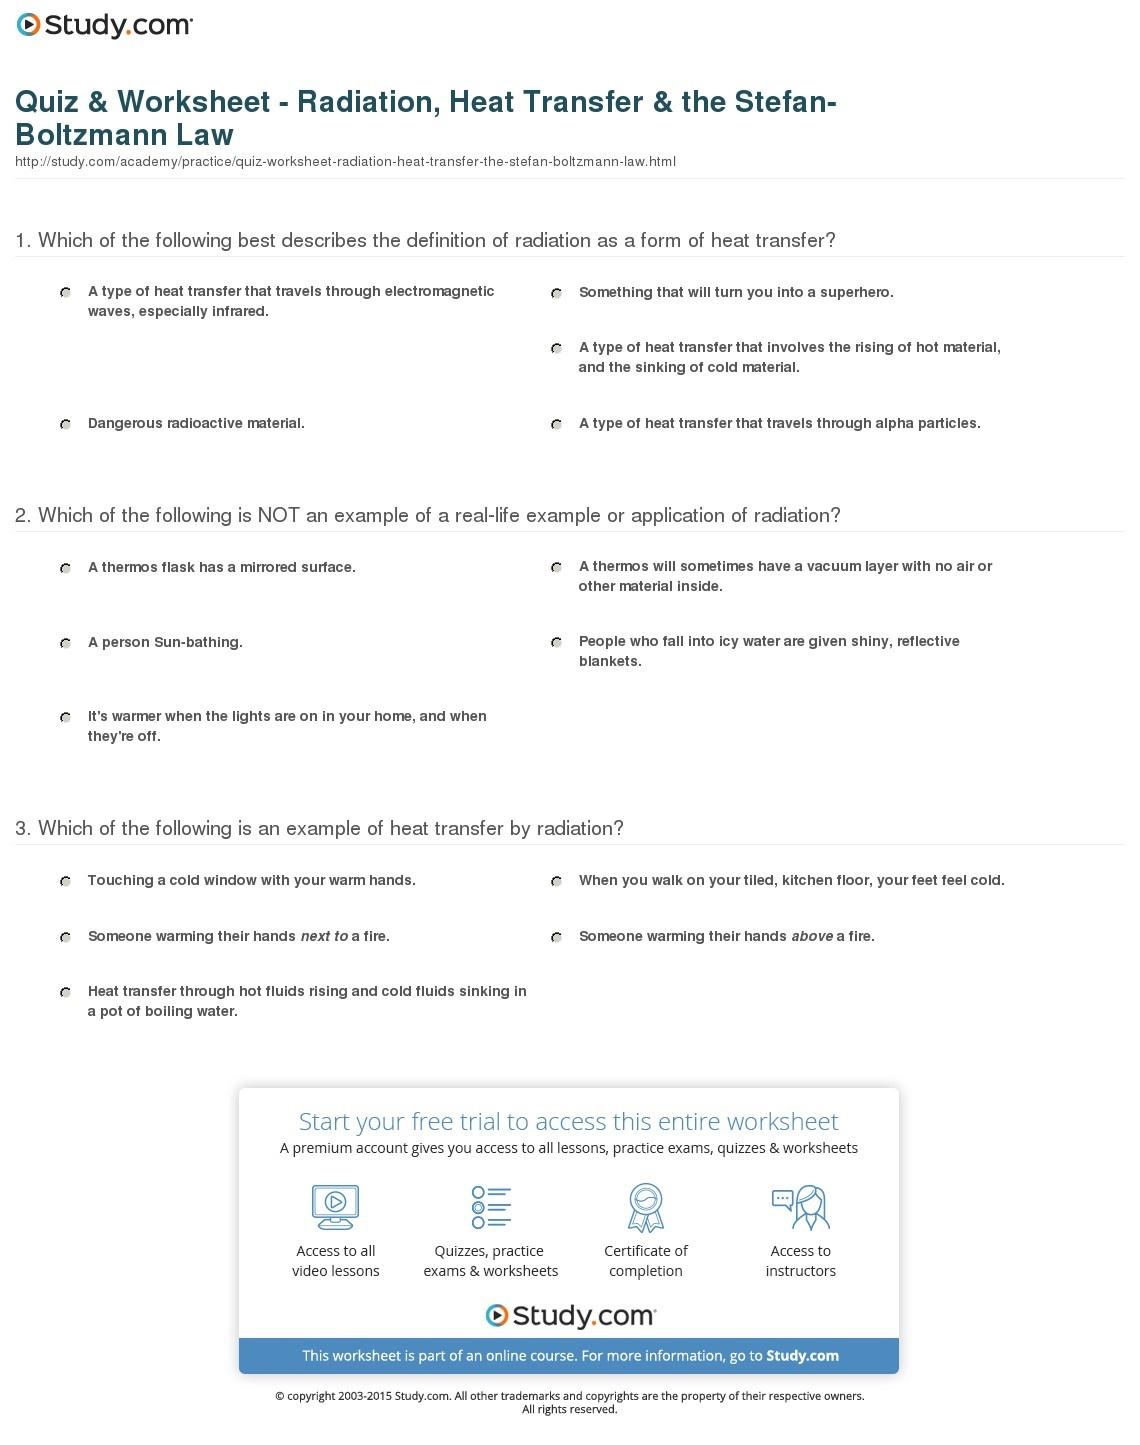 Quiz & Worksheet - Radiation, Heat Transfer & The Stefan-Boltzmann - Free Printable Heat Transfer Worksheets